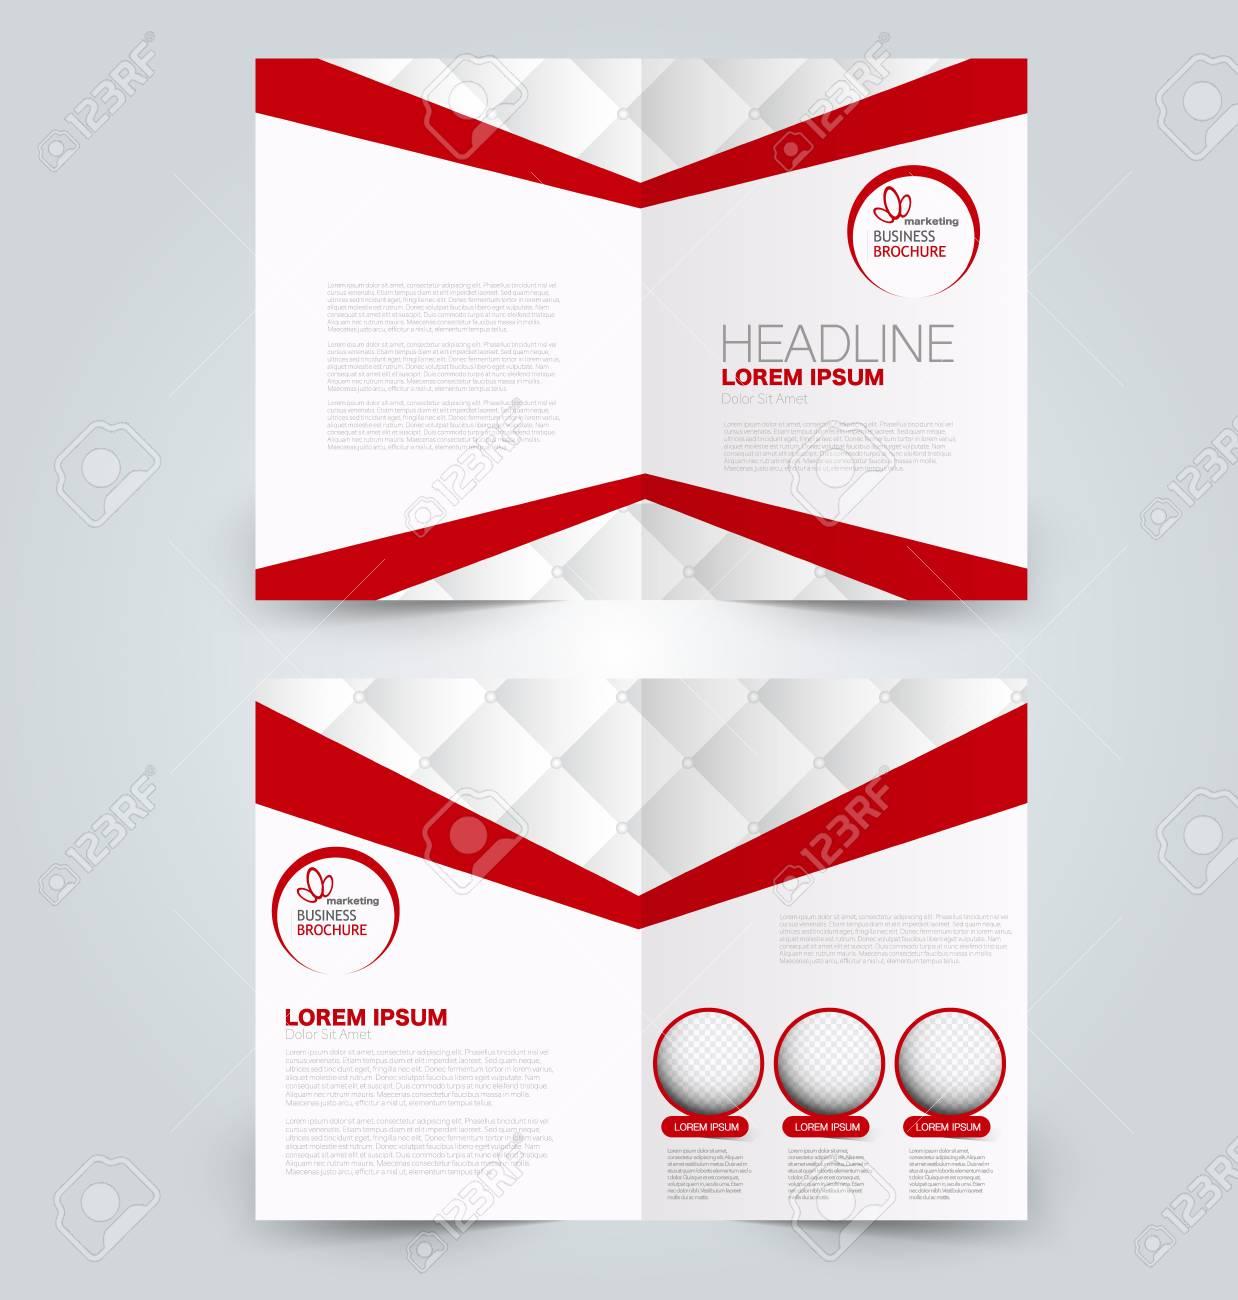 Fold Brochure Template Flyer Background Design Magazine Cover 1238x1300